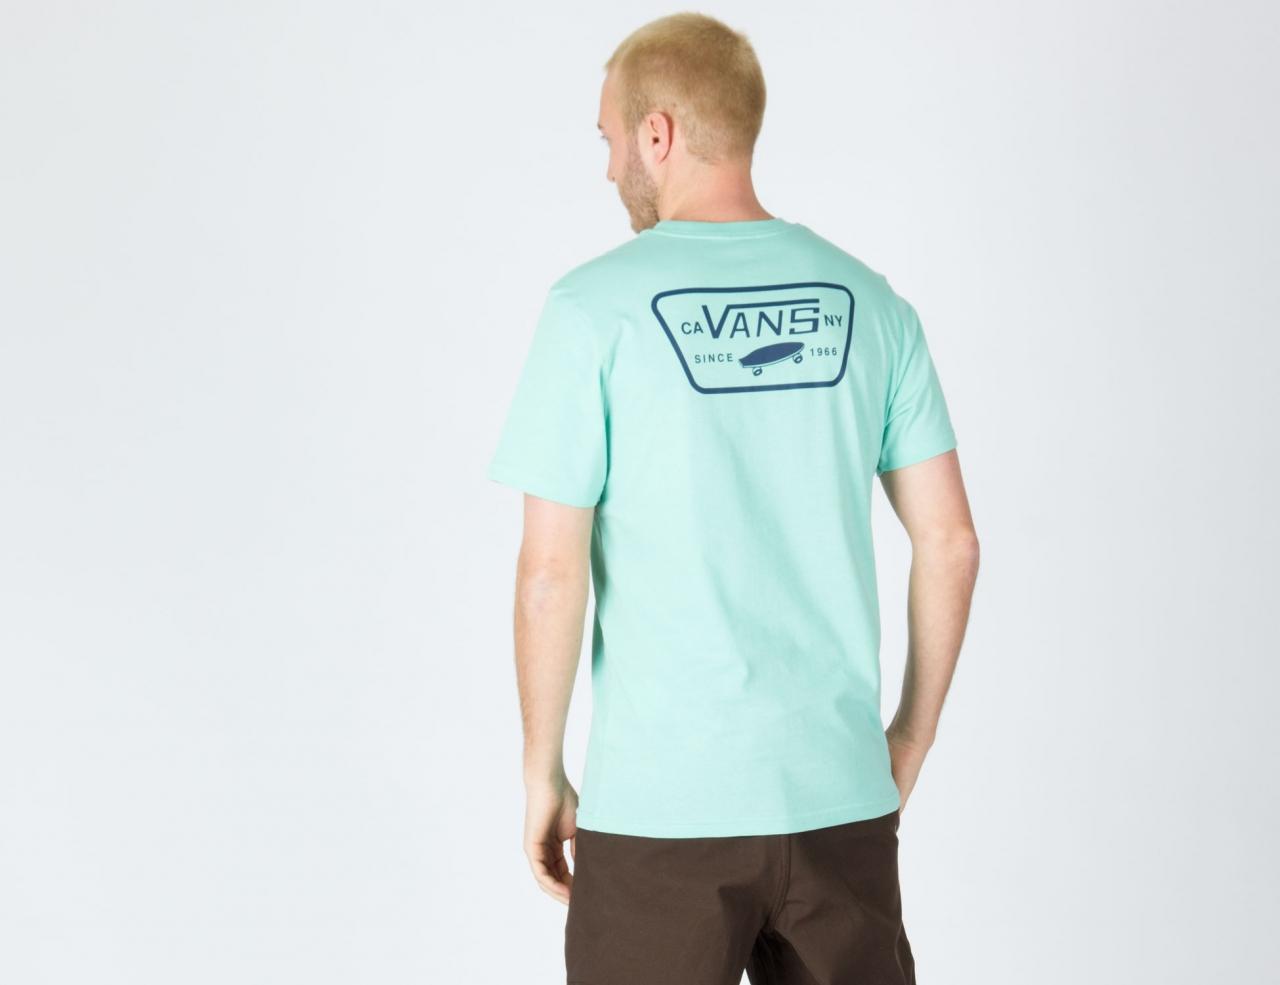 VANS Full Patch Back Shirt - Dusty Jade Green